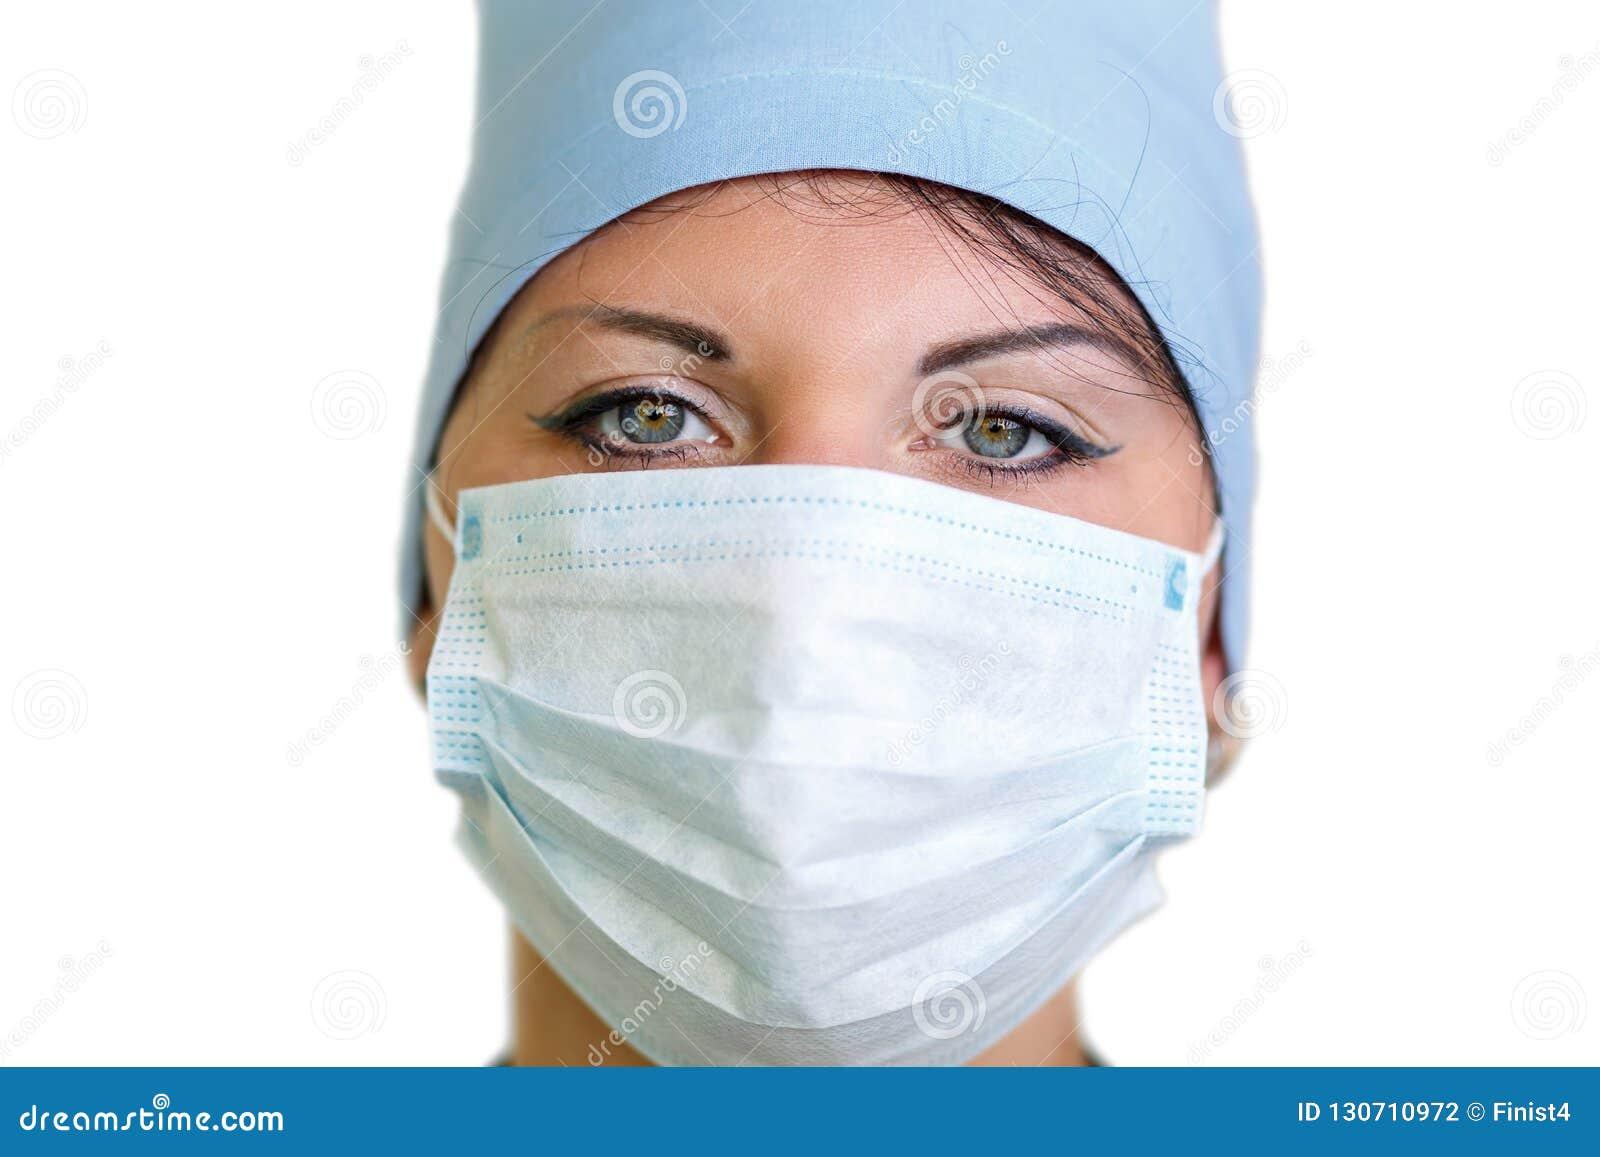 masque visage medical